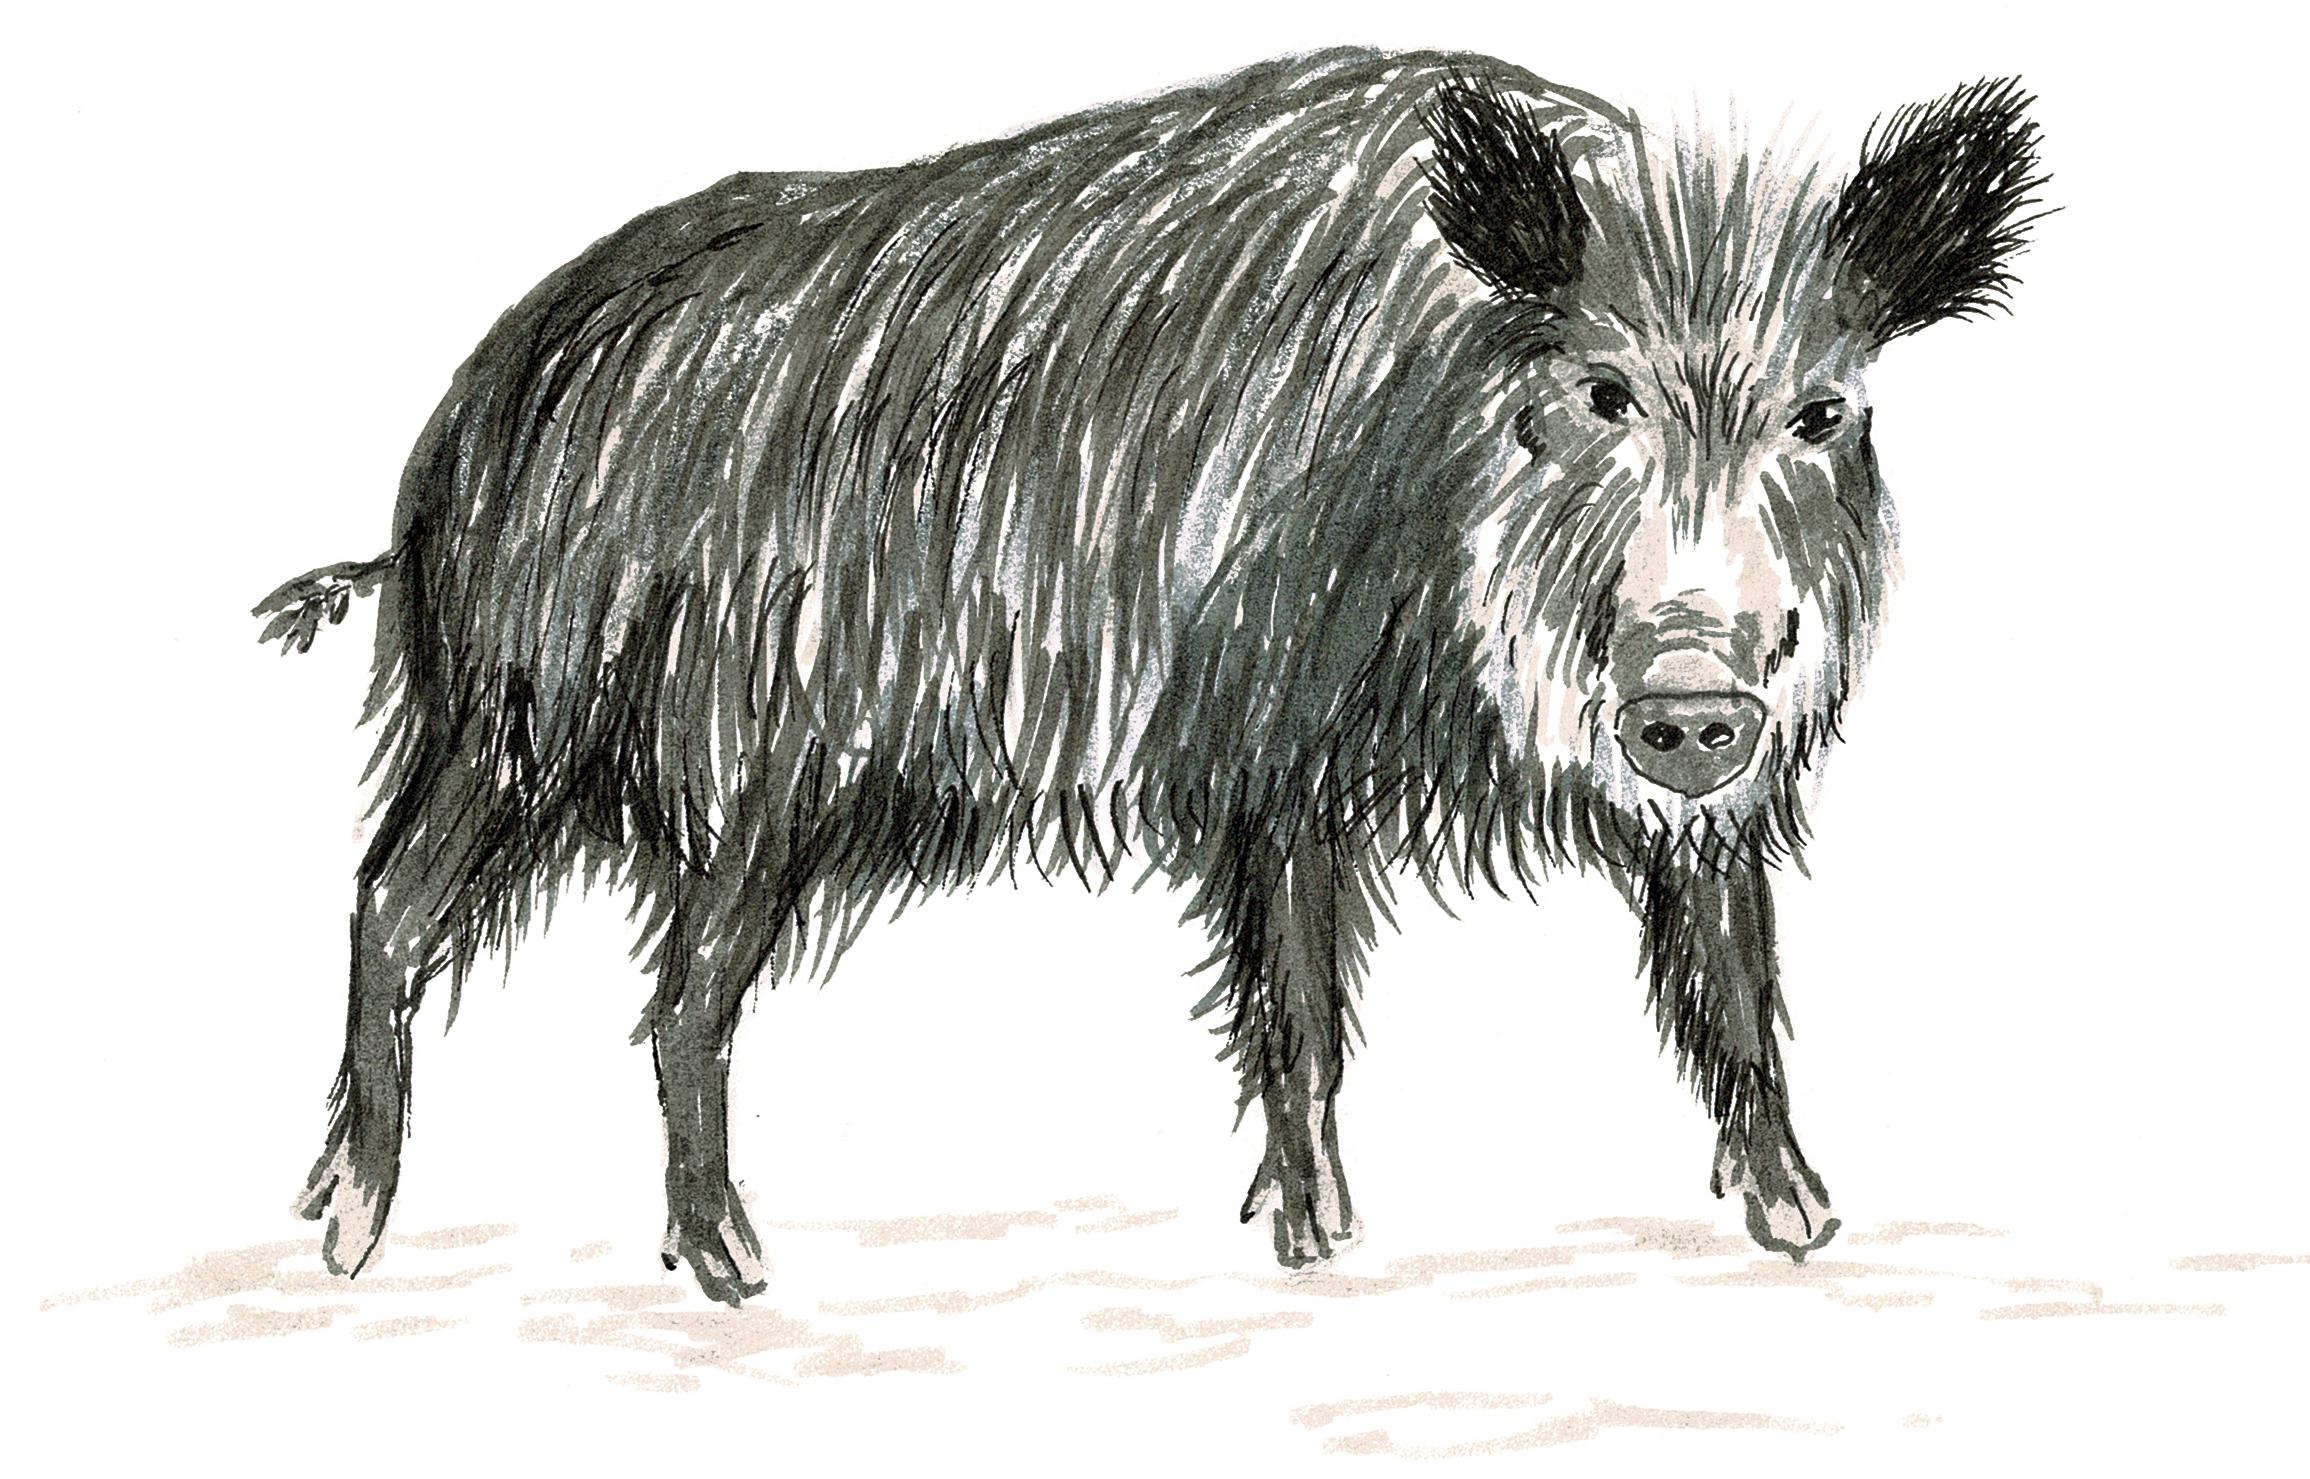 Emely - die kluge Wildschweindame